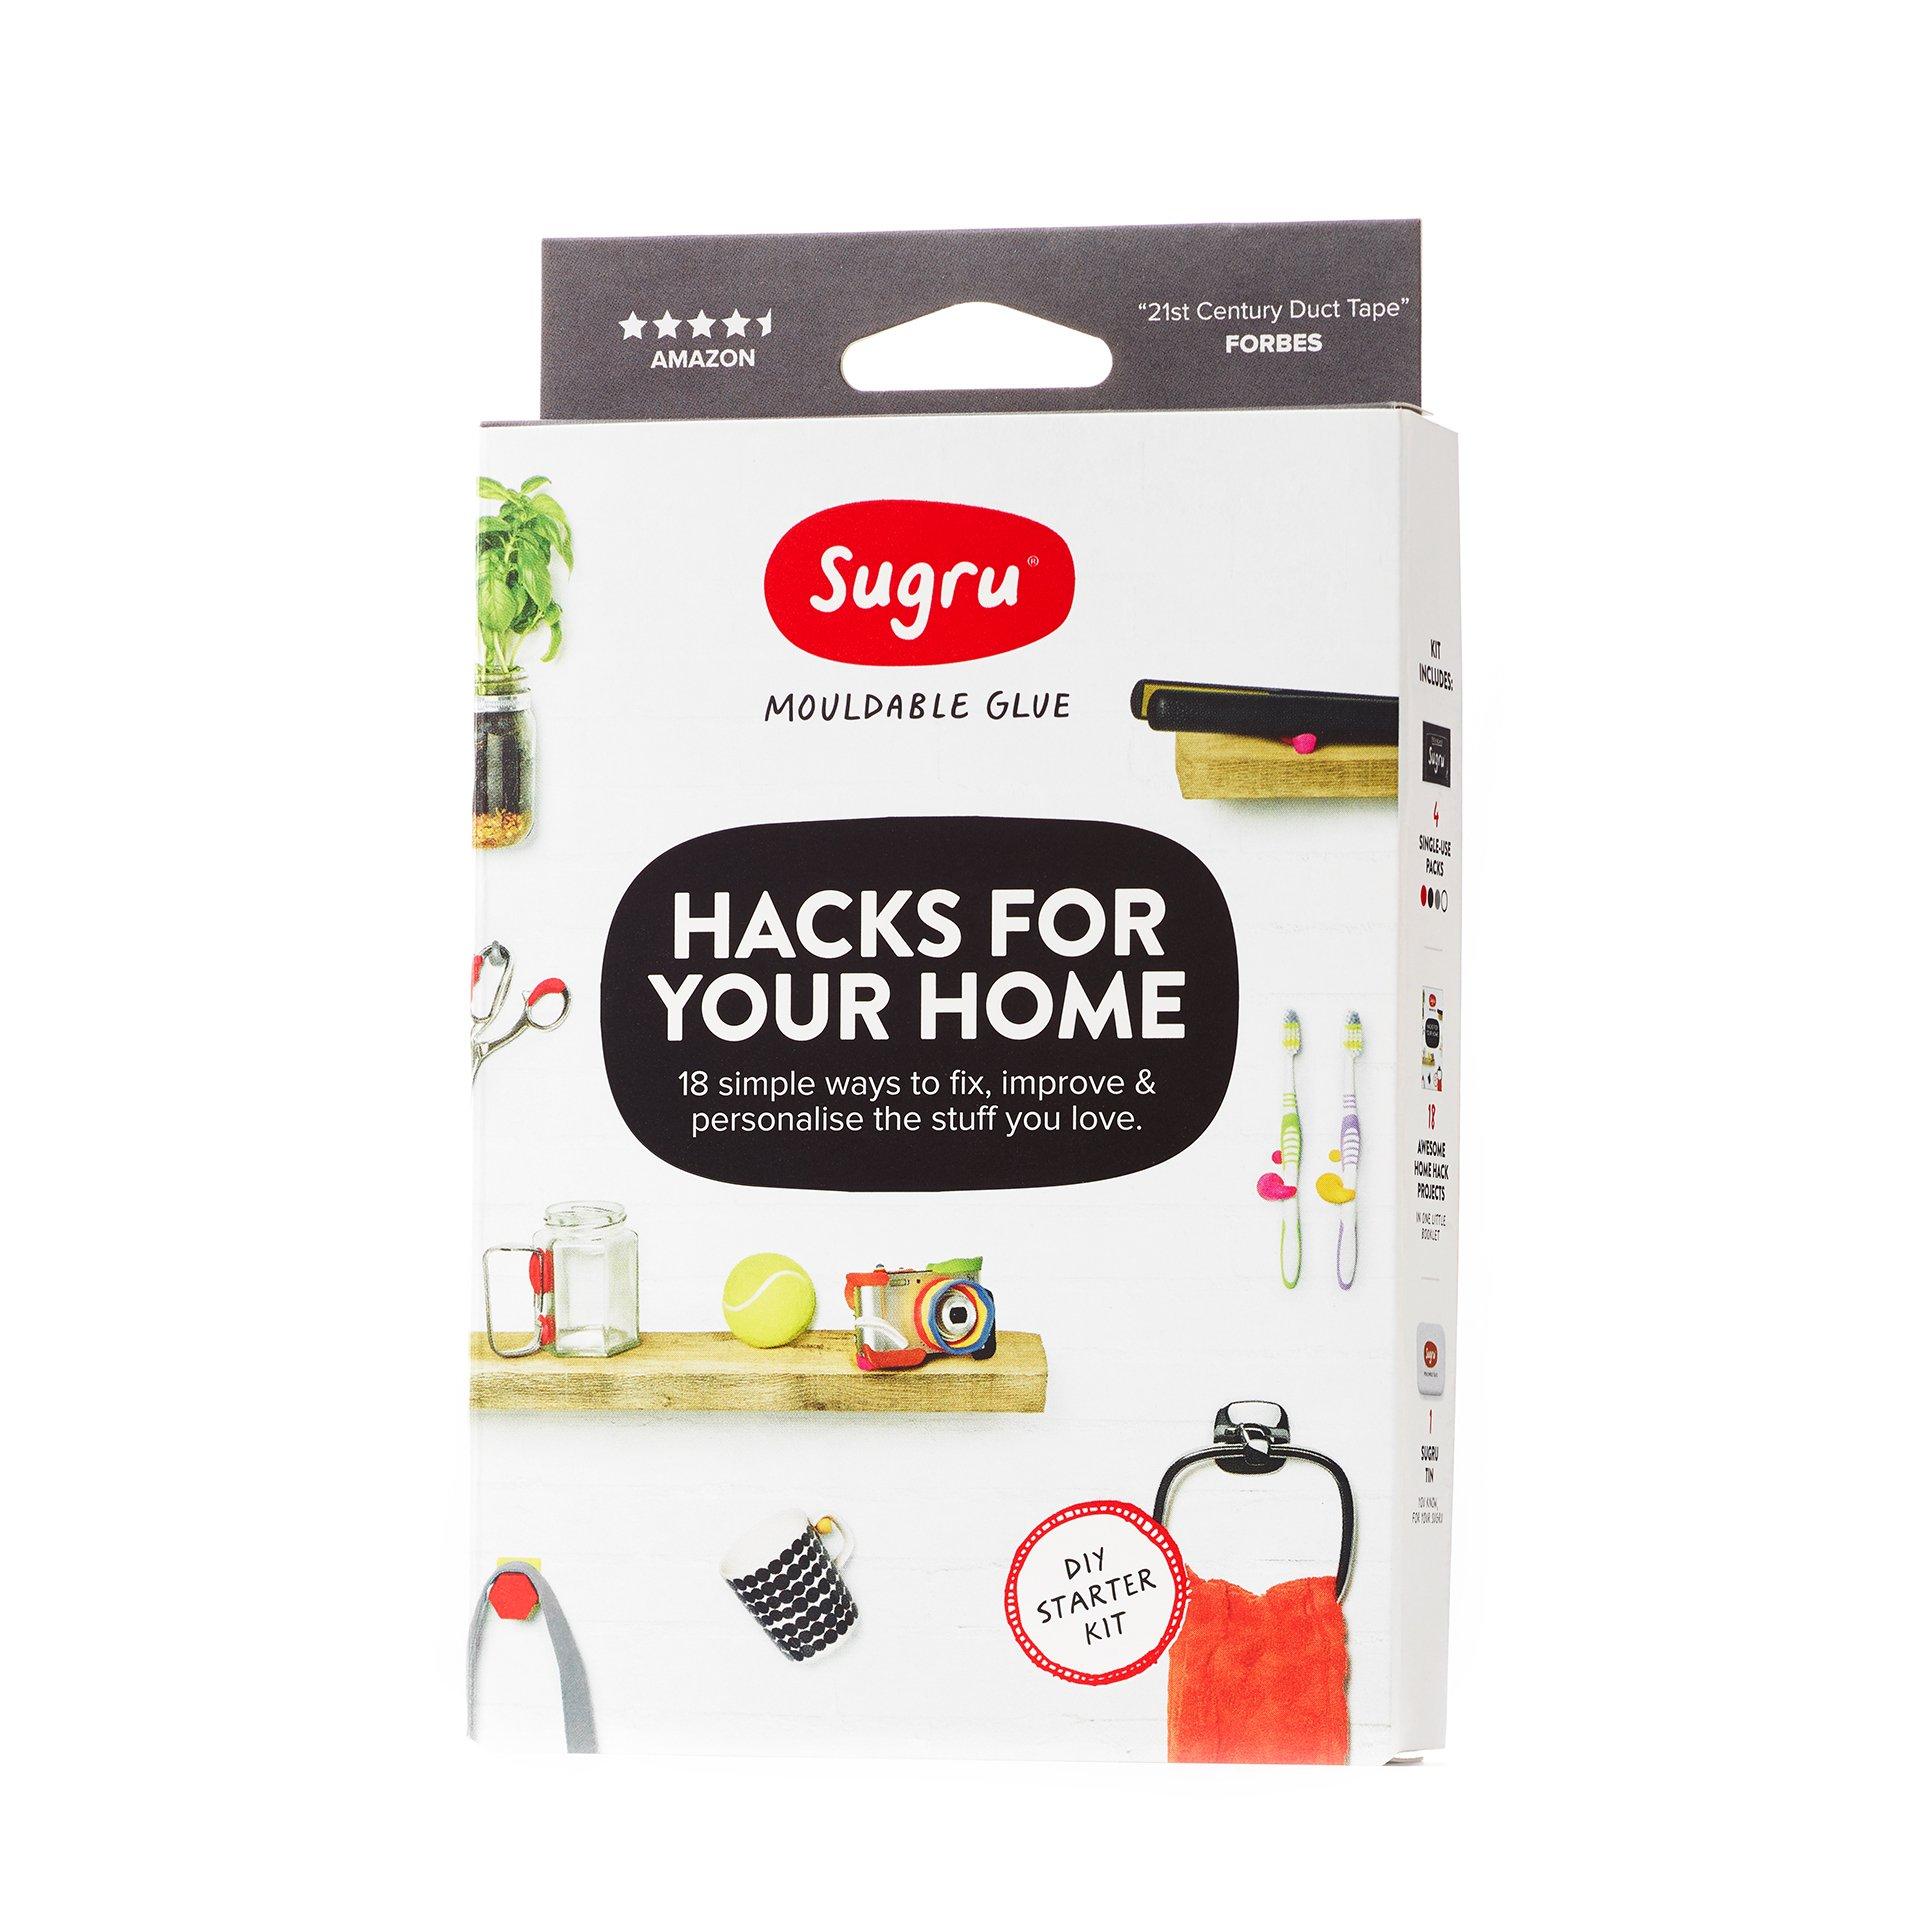 Sugru SHOMEKIT01 Hacks for Your Home Kit, Black, White, Grey and Red 4 Piece